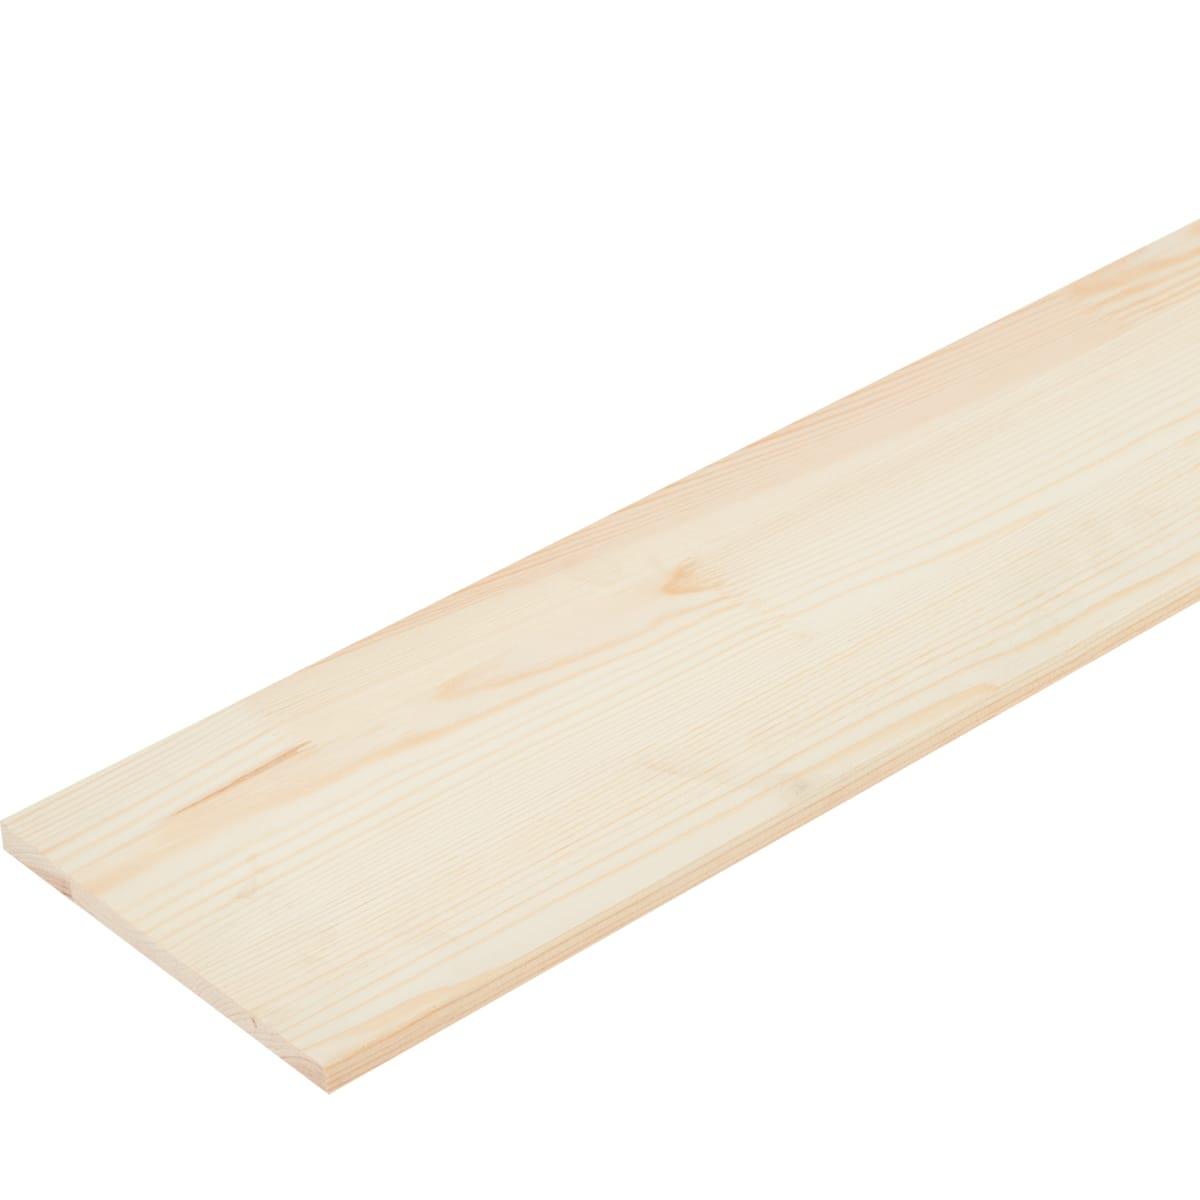 Панель деревянная экстра 11х150х3000 мм